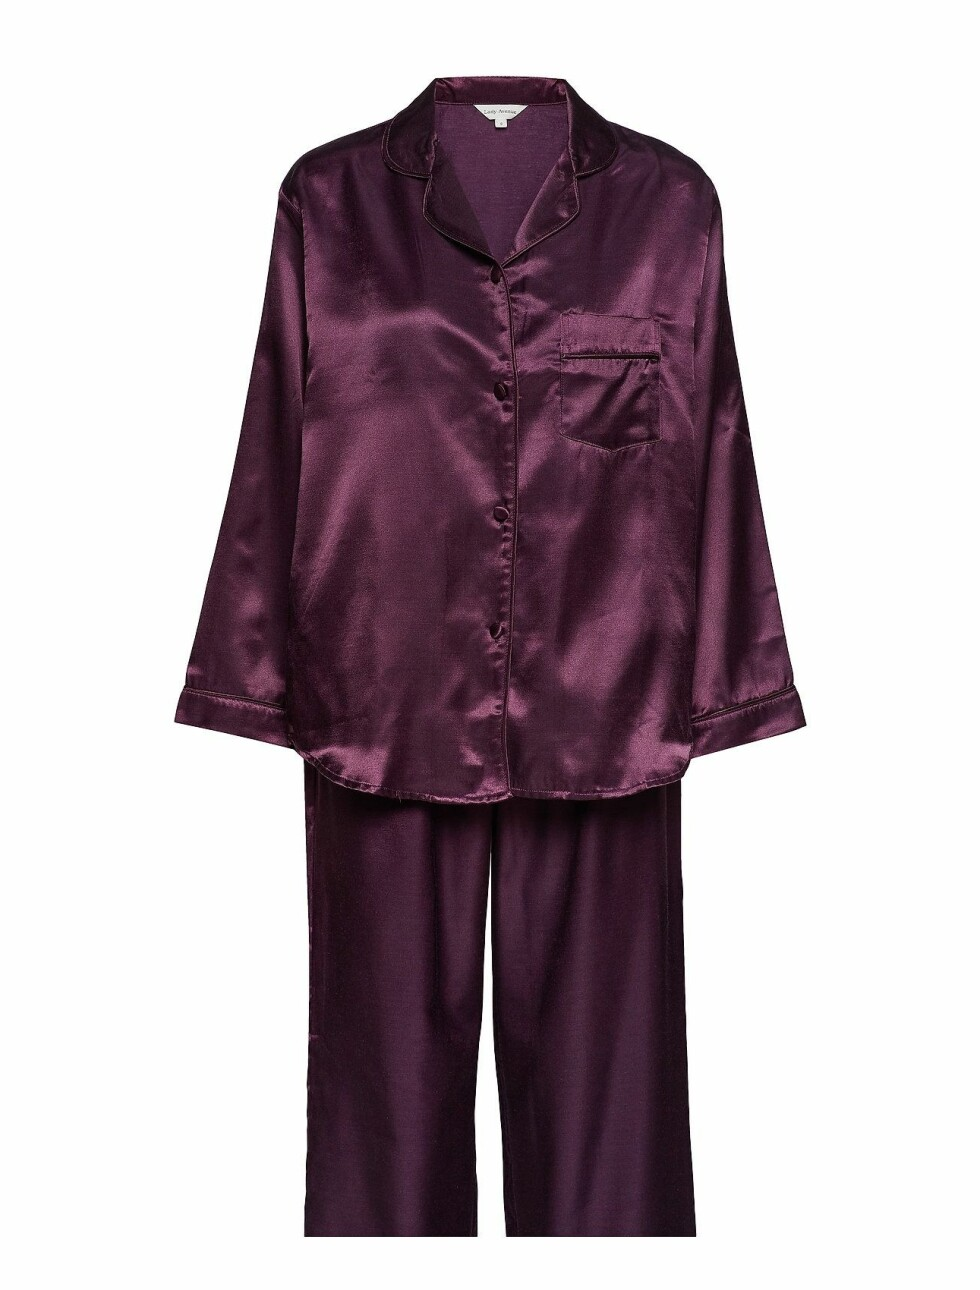 Pysj fra Lady Avenue |499,-| https://www.boozt.com/no/no/lady-avenue/pyjamas_3419386/8570456?navId=67585&group=listing&position=1000000